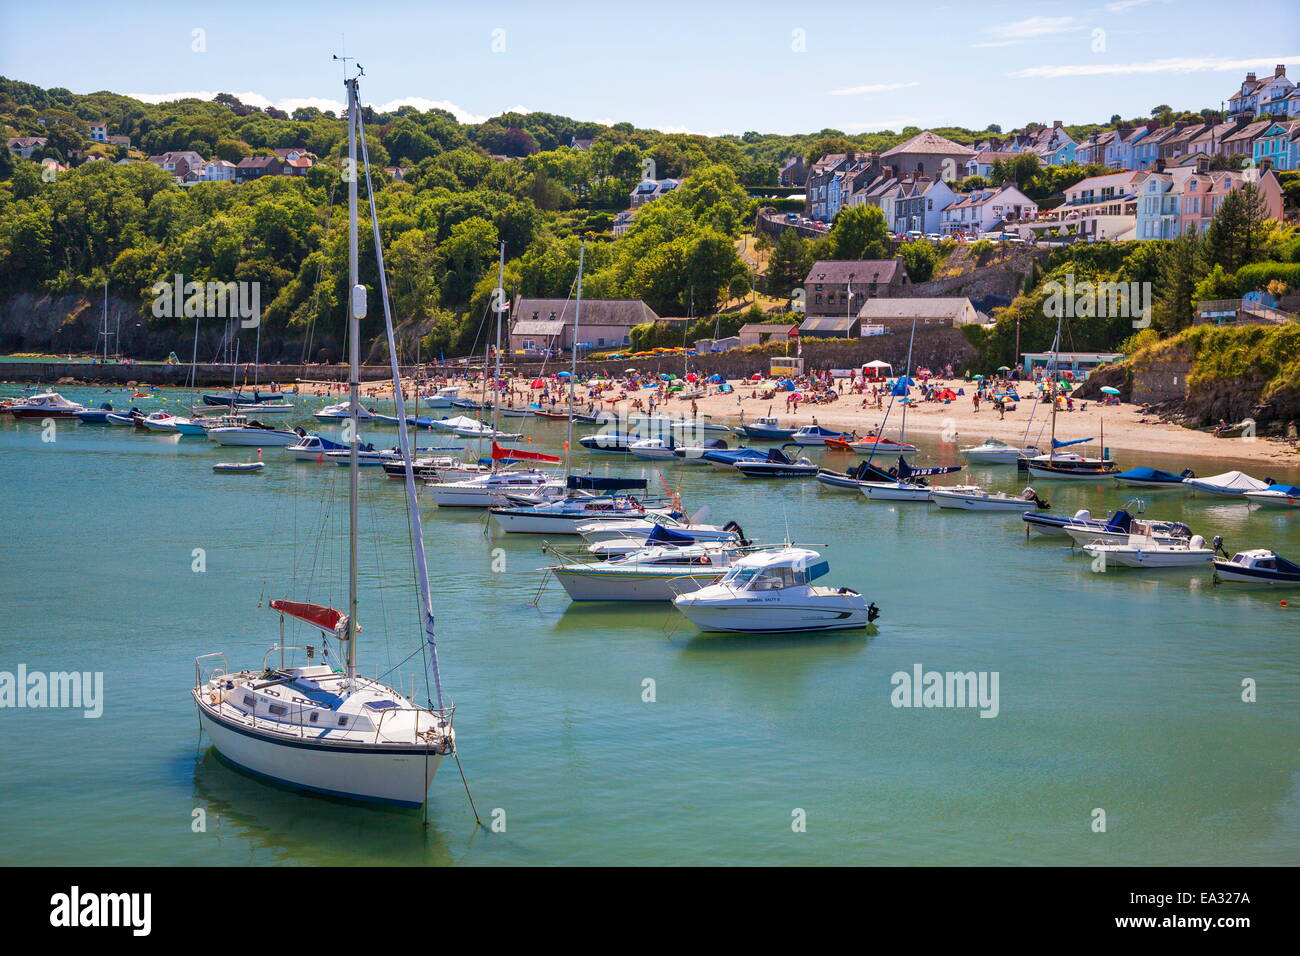 New Quay, Ceredigion, Dyfed, West Wales, Wales, United Kingdom, Europe Stock Photo